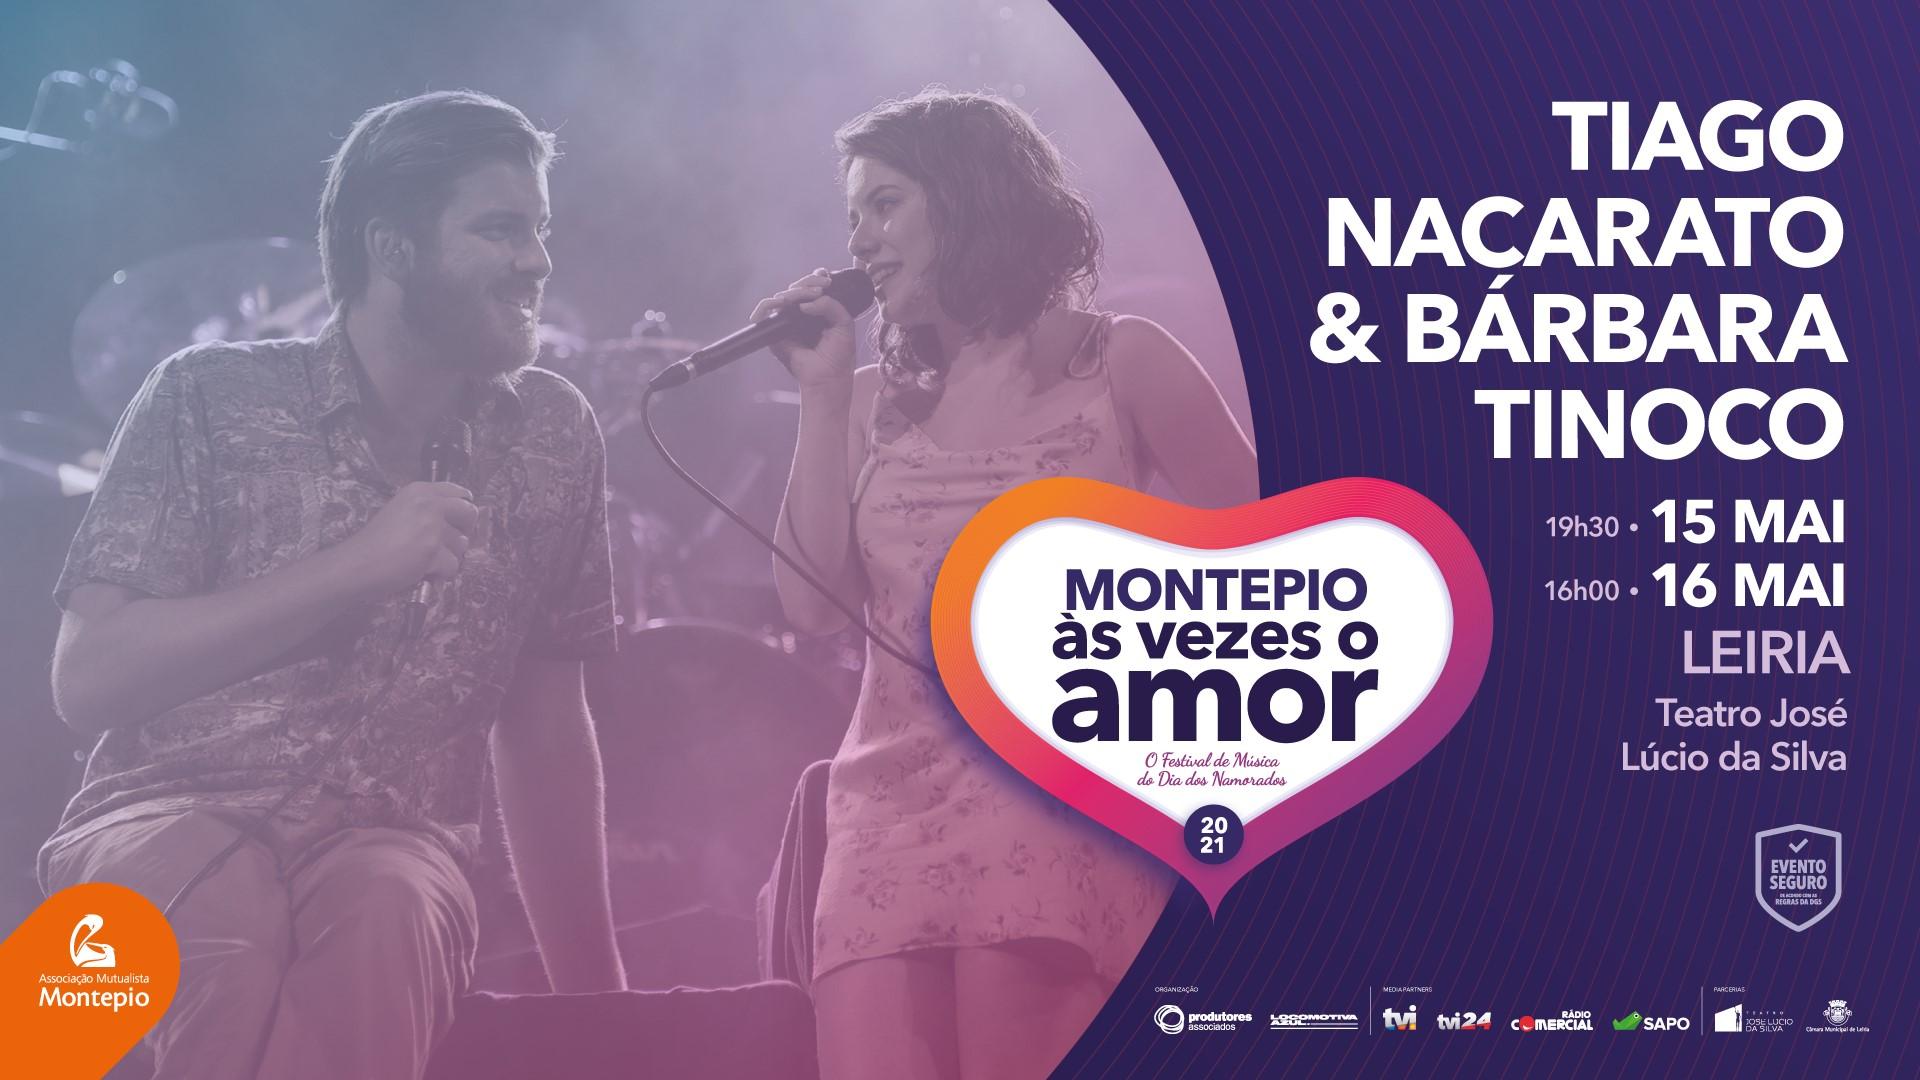 TIAGO NACARATO & BÁRBARA TINOCO - Montepio Às Vezes o Amor - LEIRIA